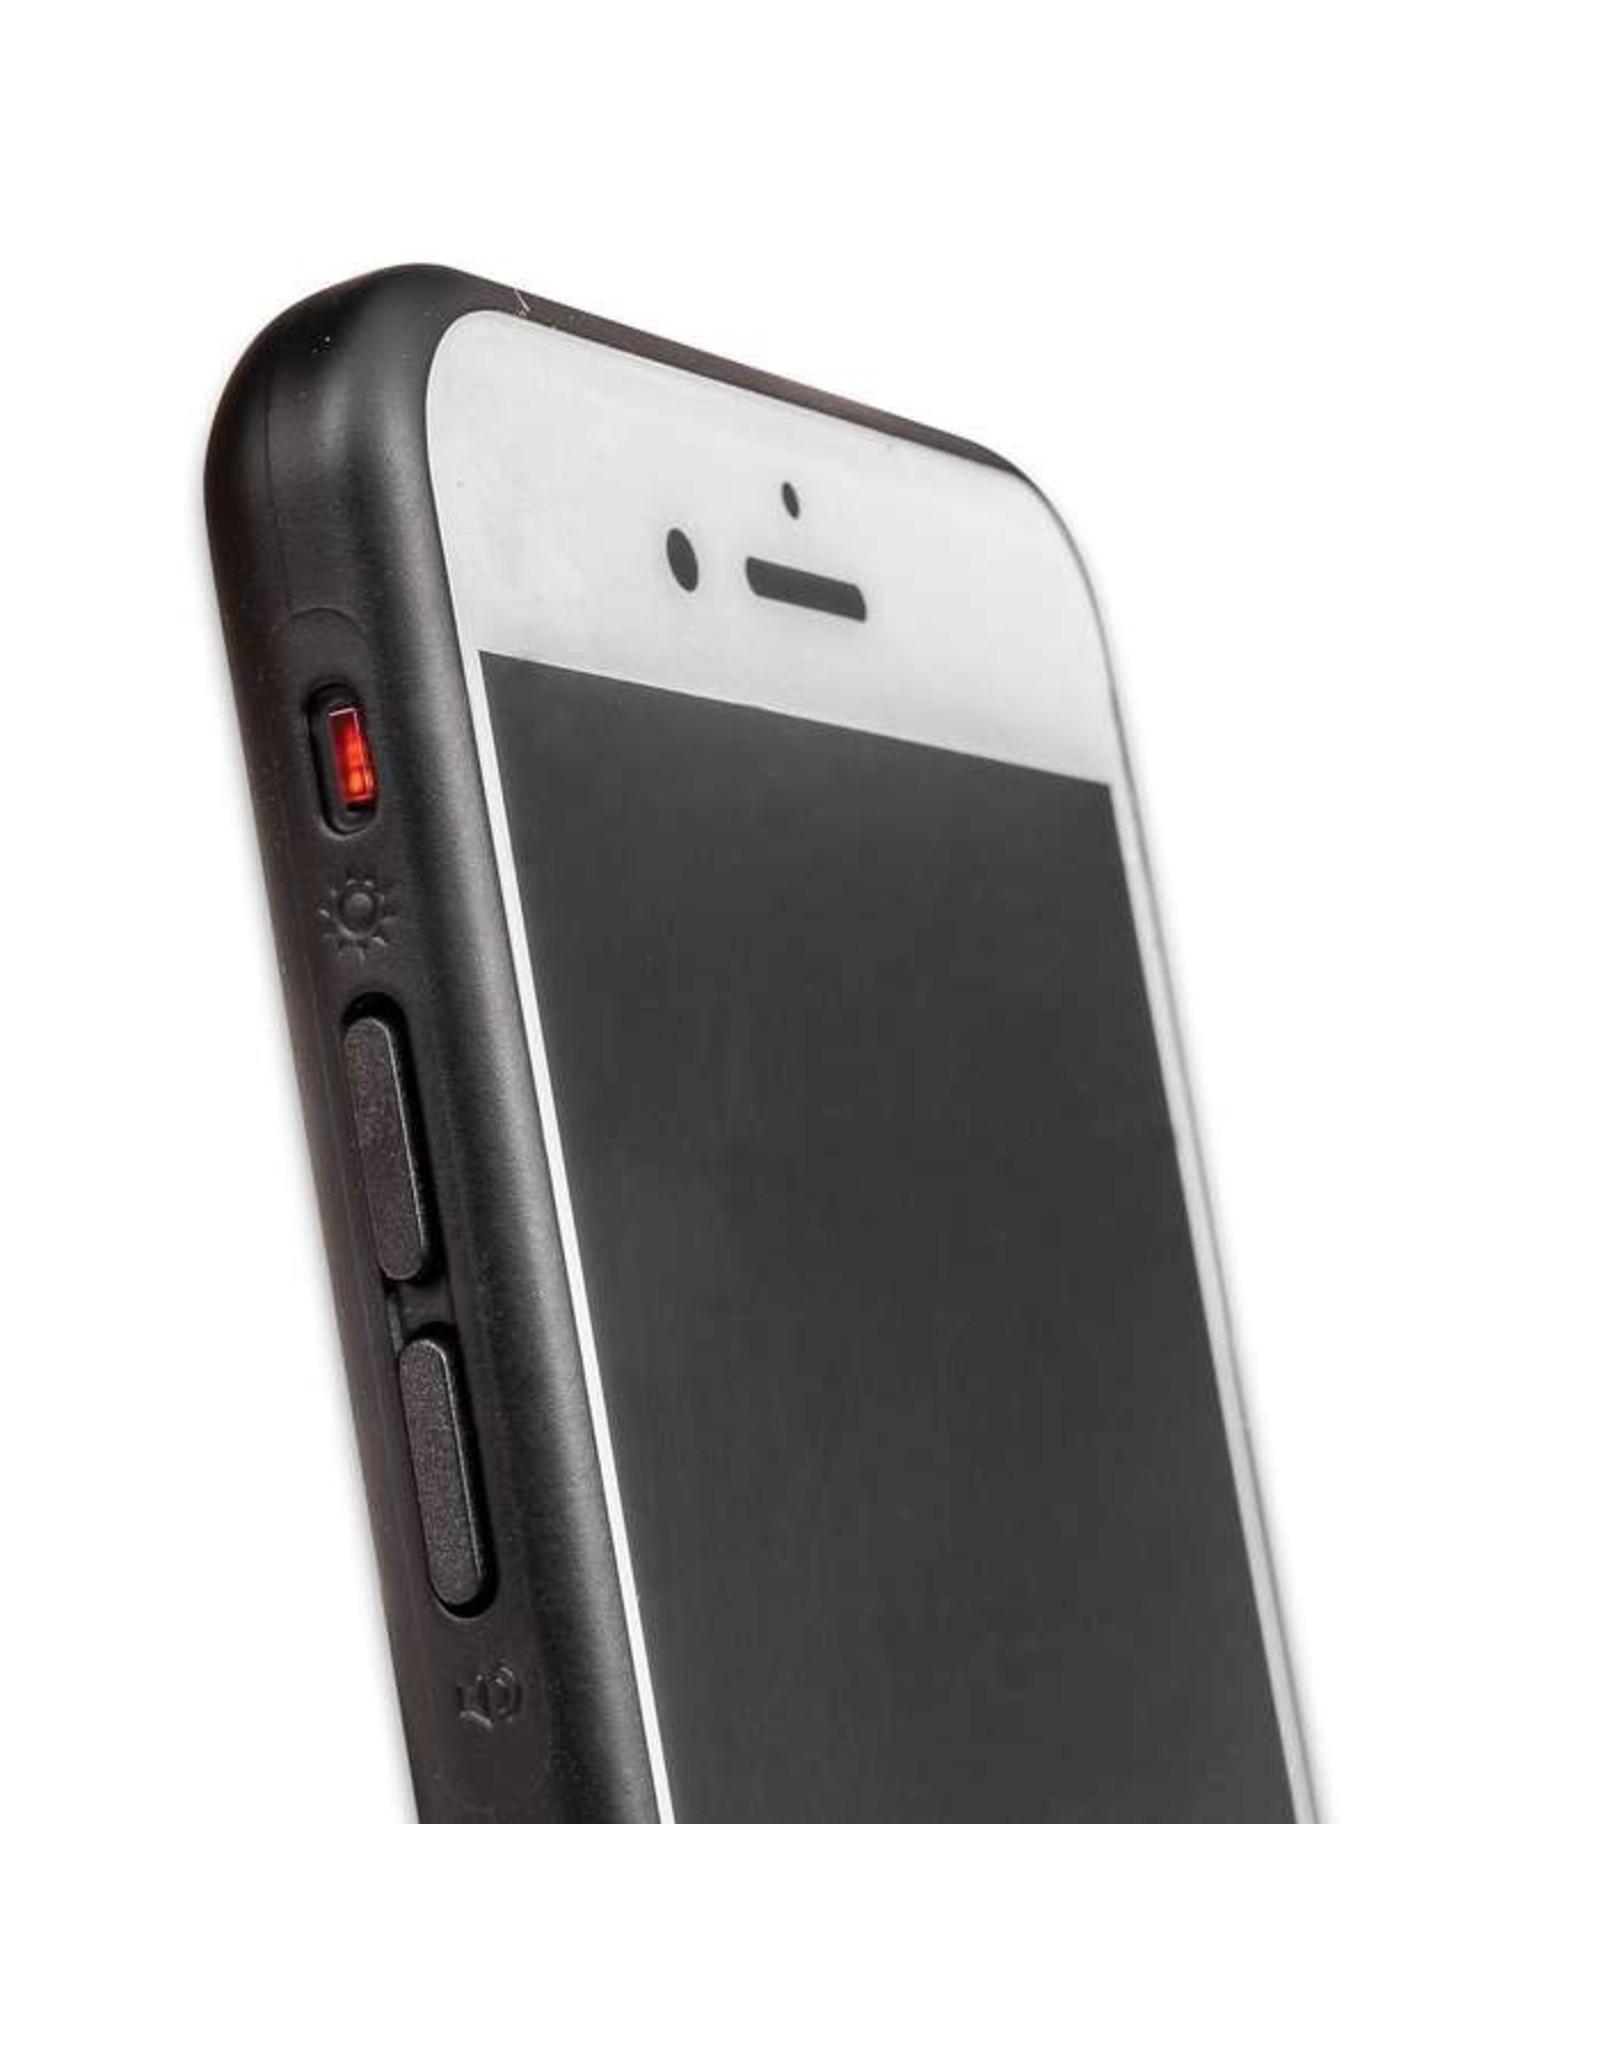 Smartphone Stun Gun